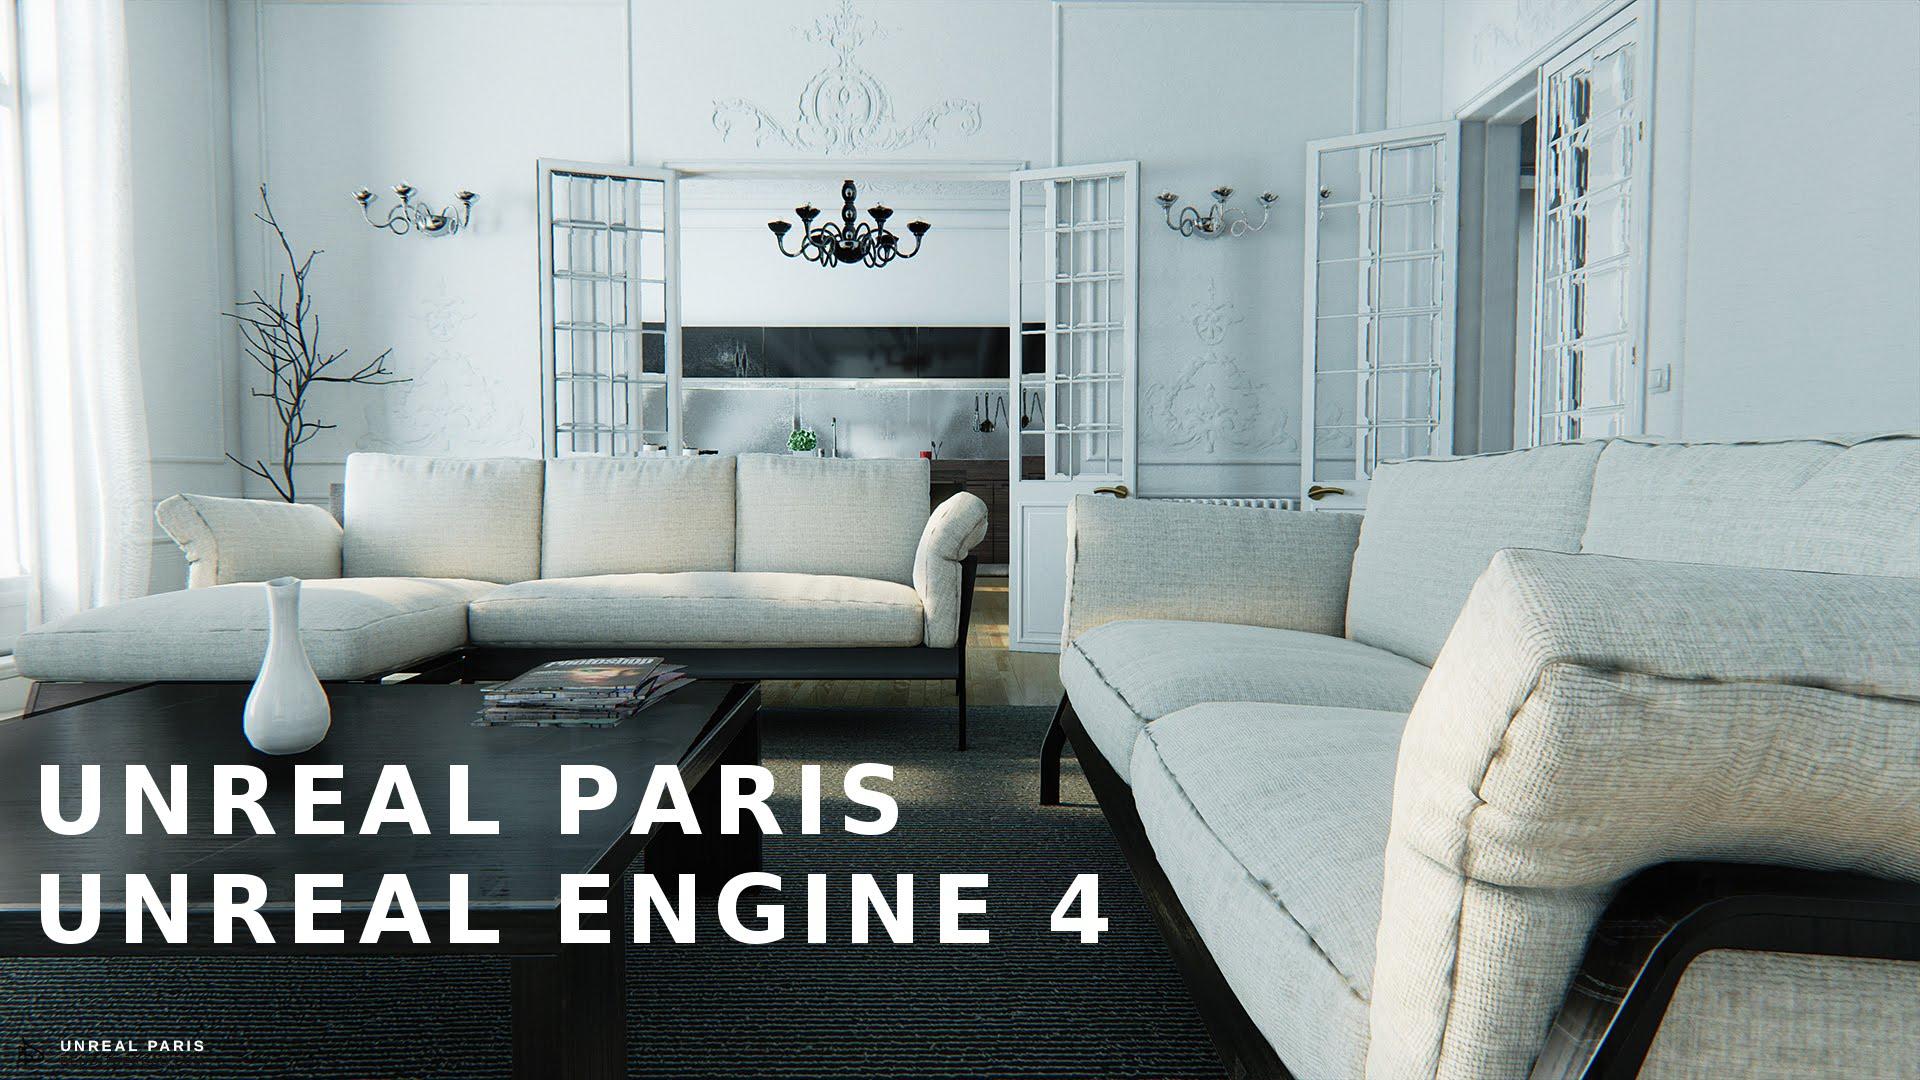 OMG, is it real: Unreal Engine 4 | OMG BLOG